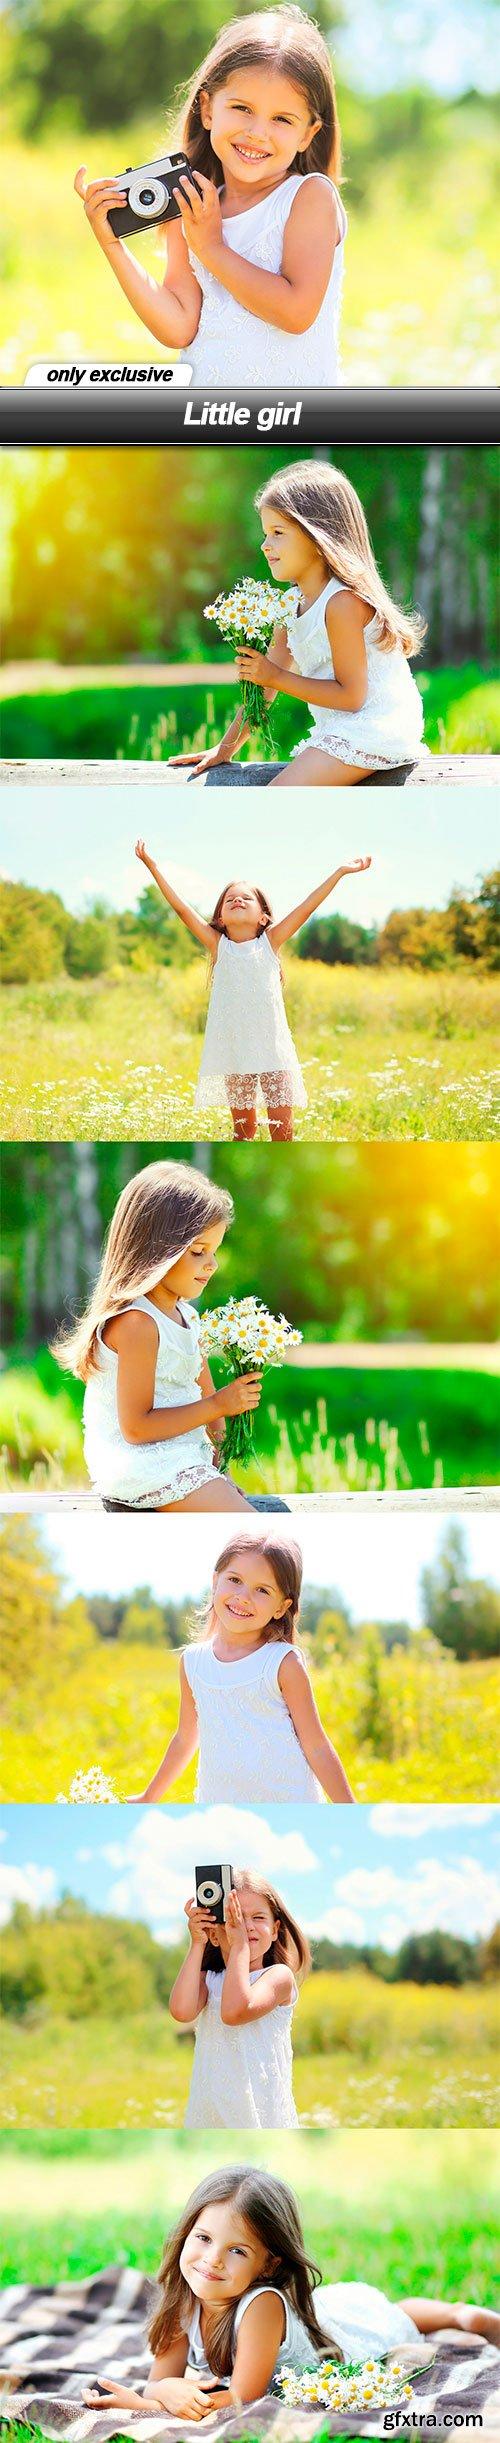 Little girl - 8 UHQ JPEG